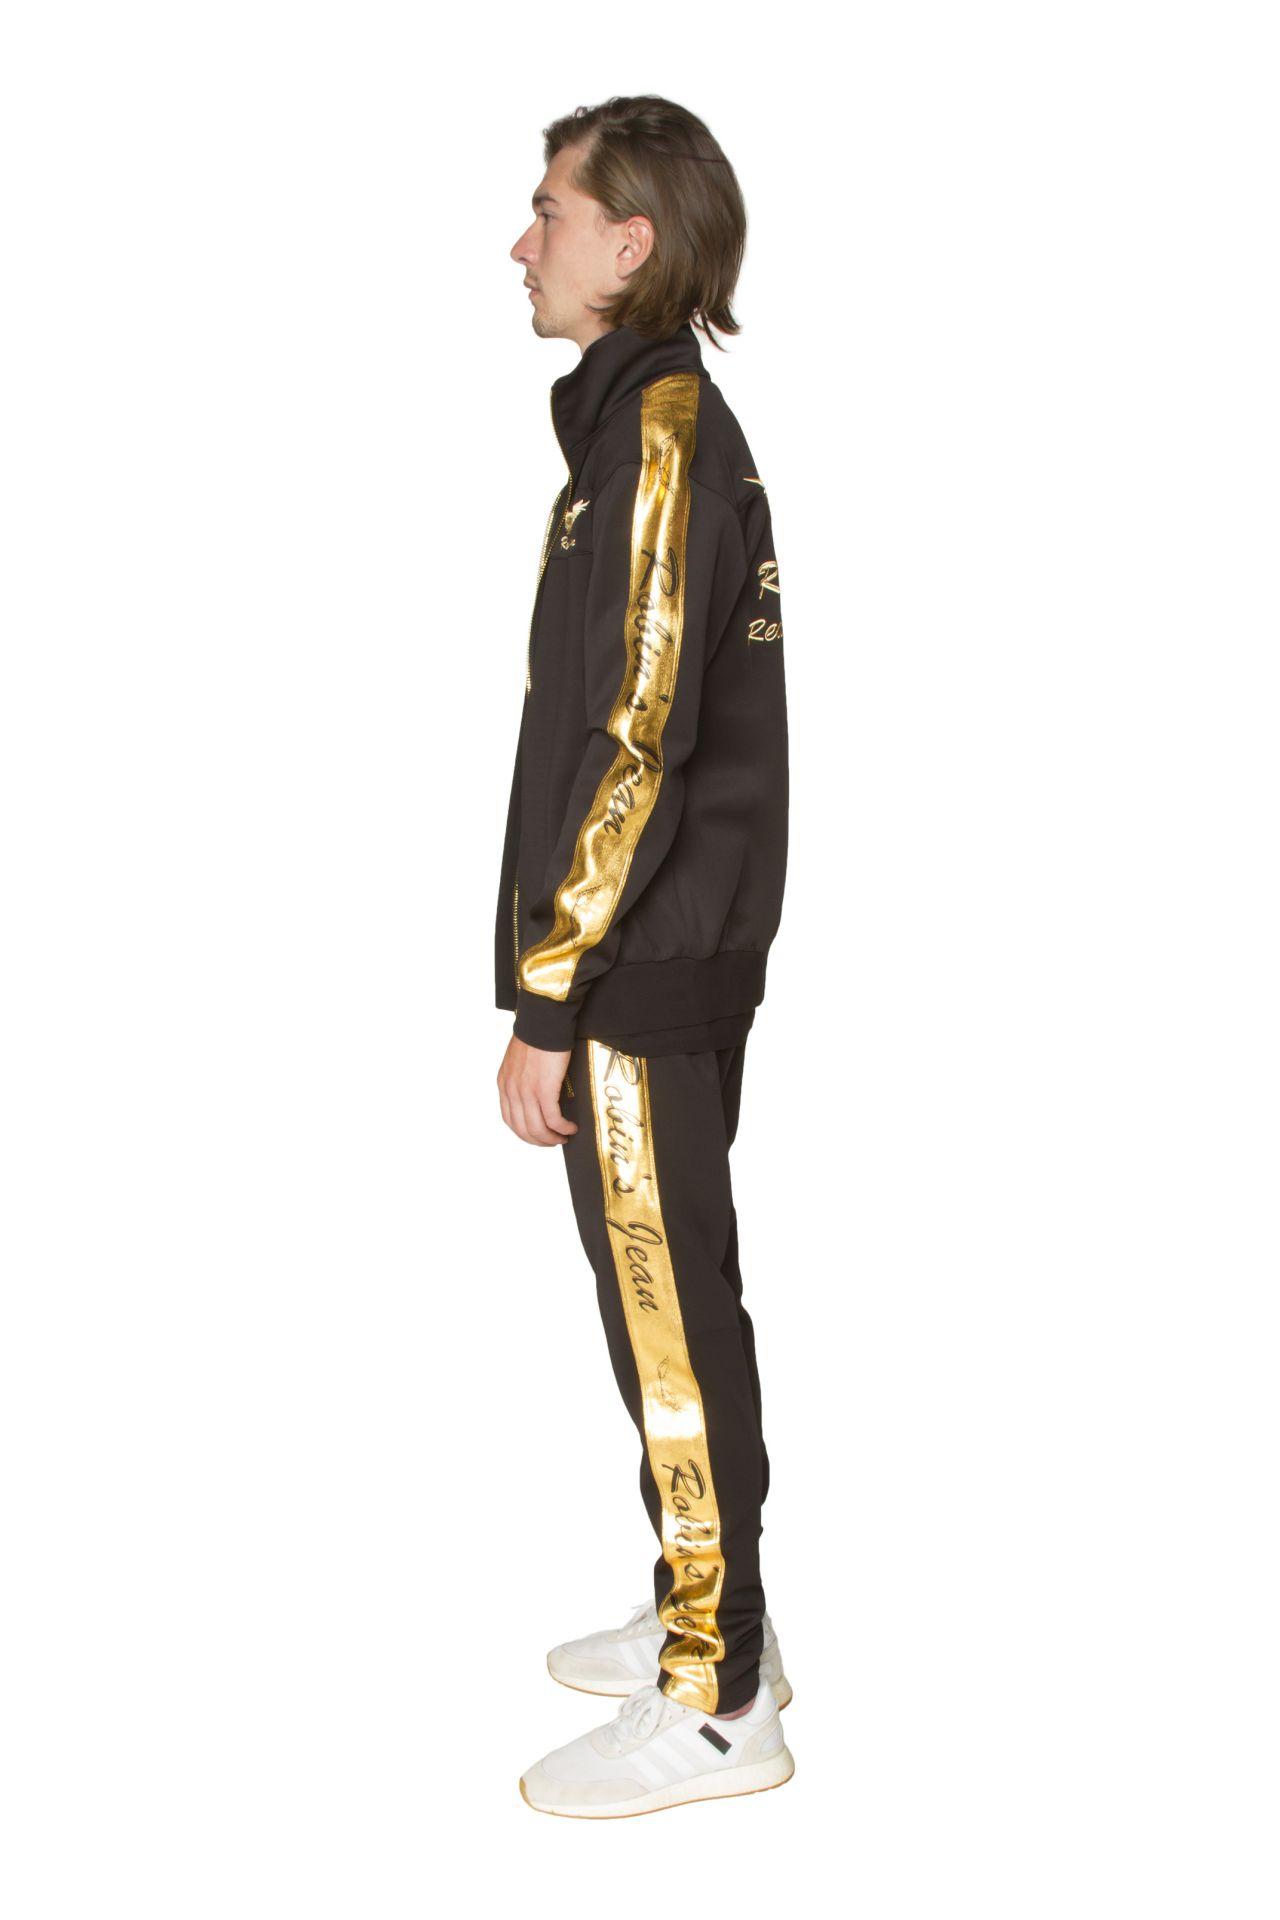 ROBIN TEAM TRACK JACKET IN GOLD ON BLACK